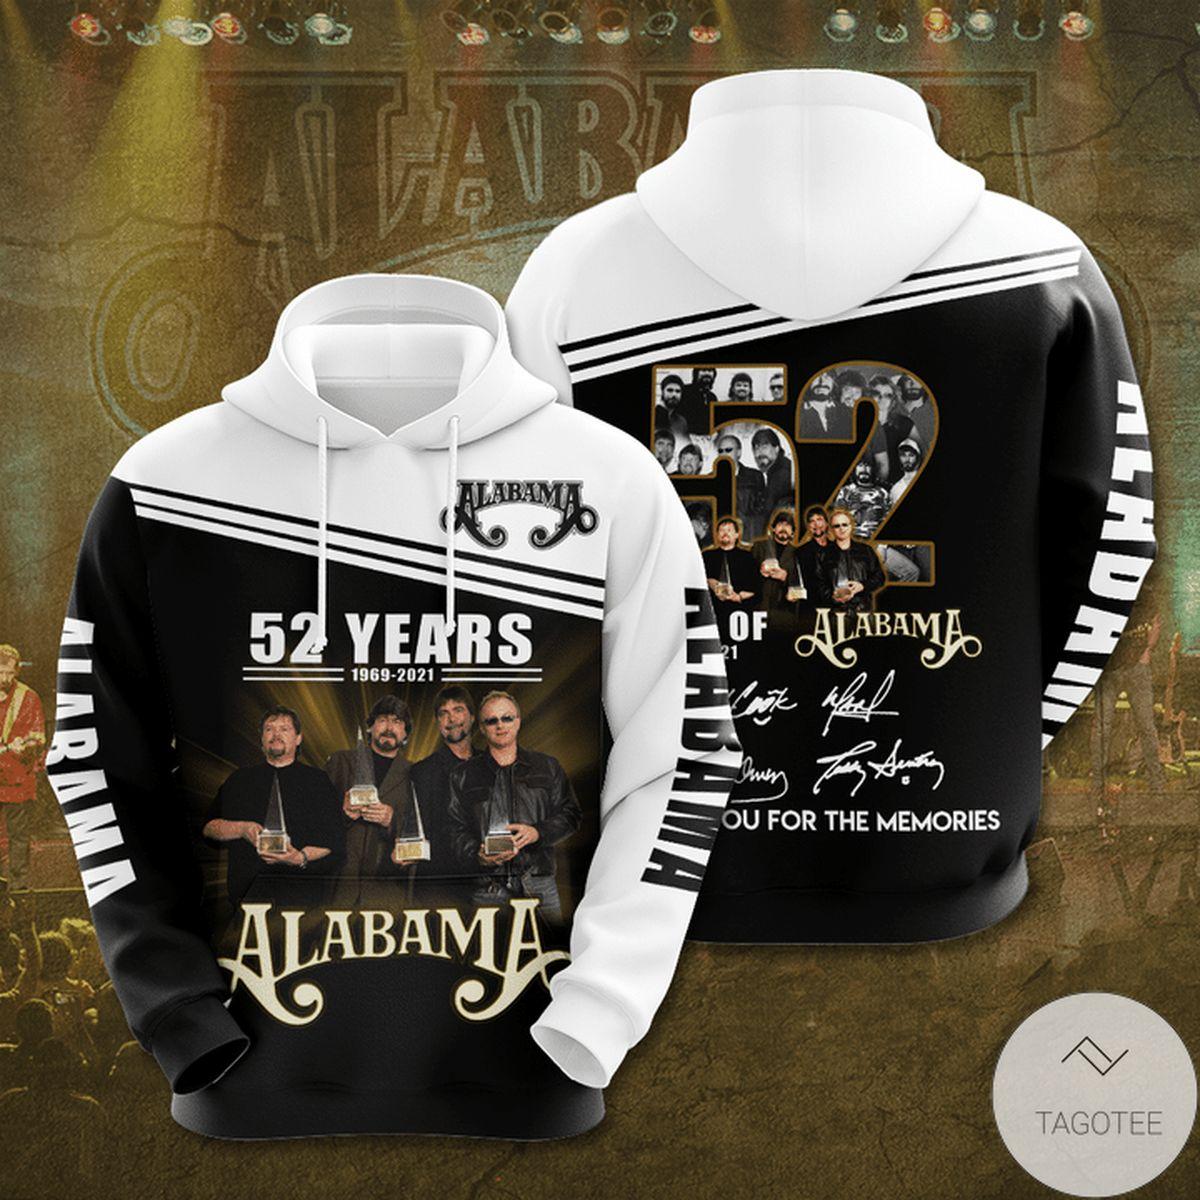 Alabama 52 Years Anniversary 1969-2021 3d Hoodie